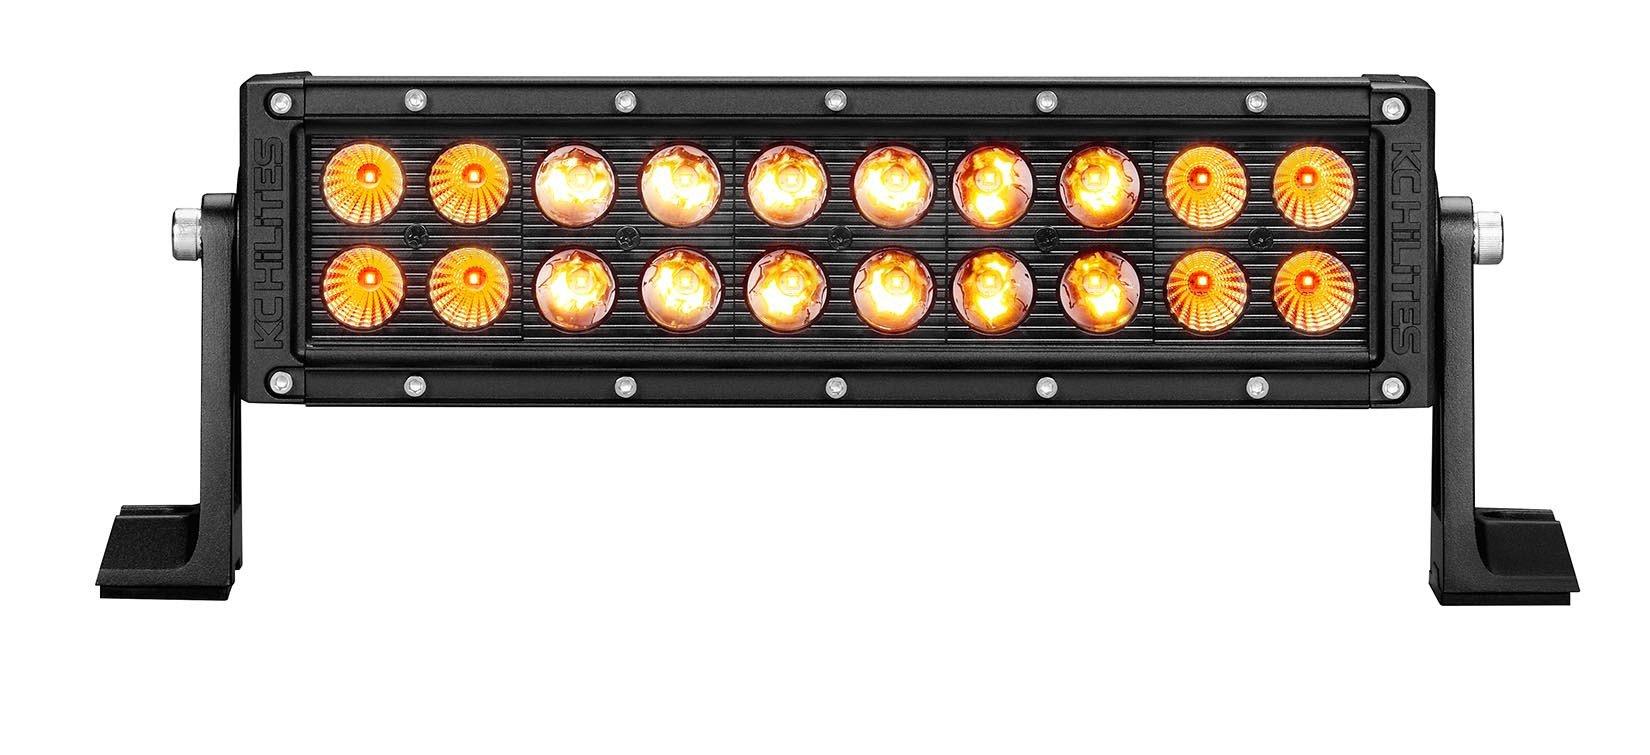 Kc hilites c series 10 led lightbar aloadofball Choice Image